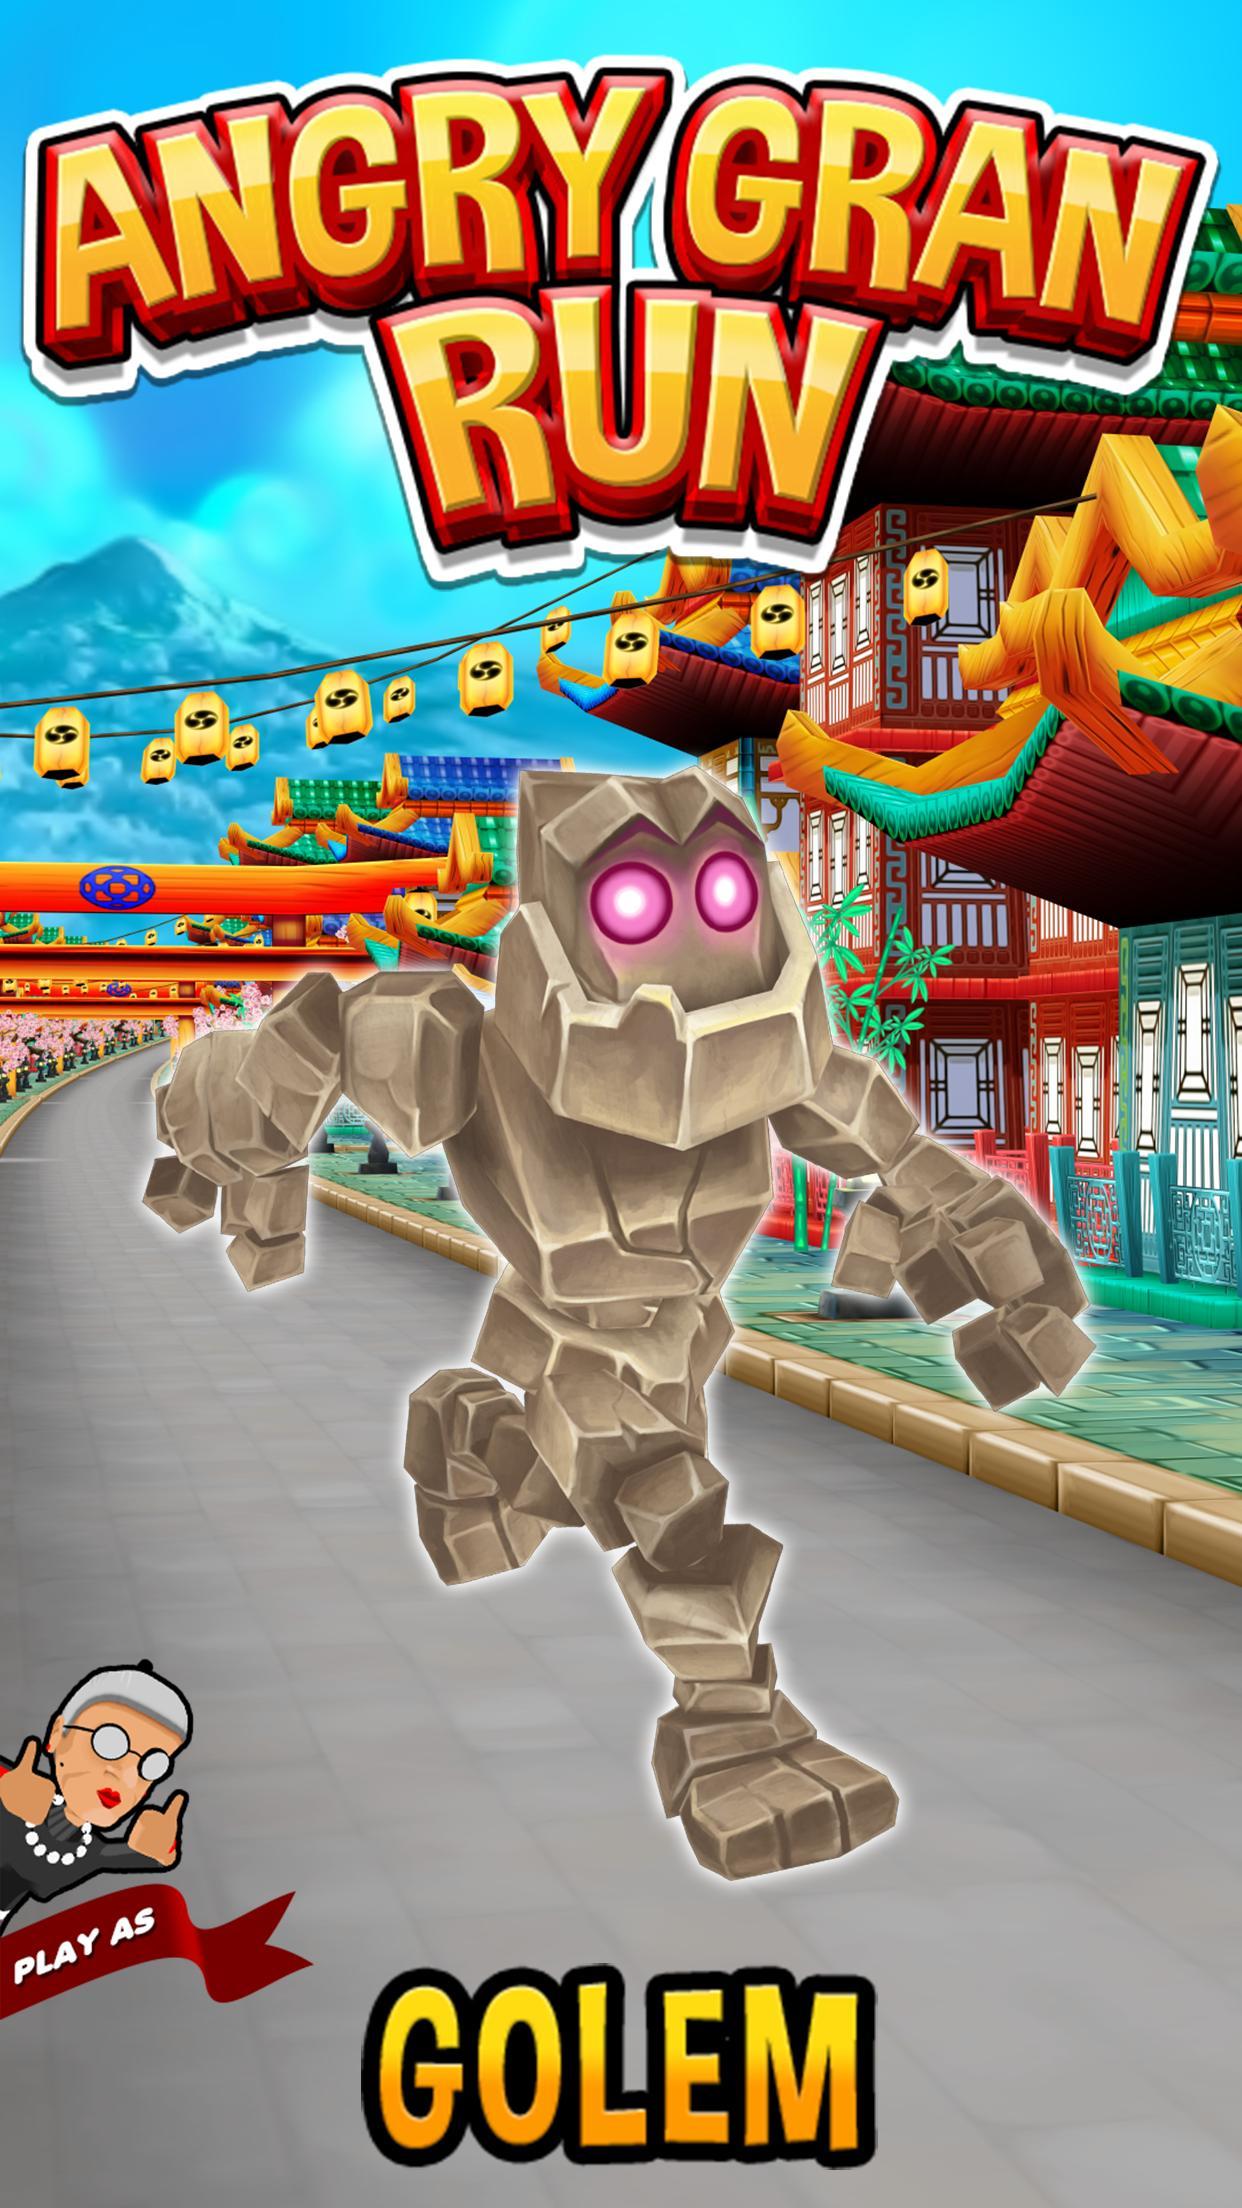 Angry Gran Run Running Game 2.12.1 Screenshot 3